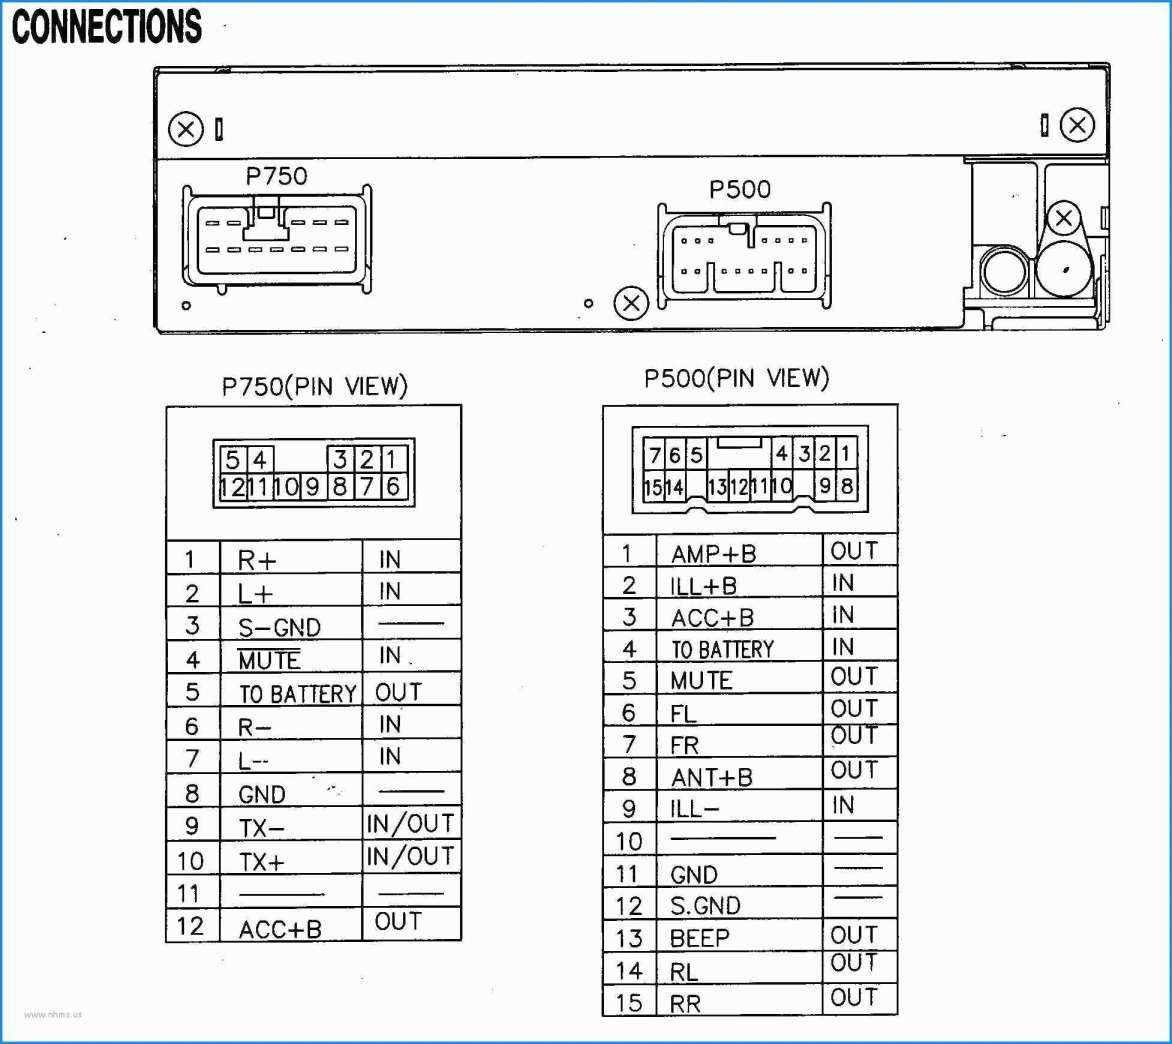 Basic Wiring Diagram For Car Stereo and All Wiring Diagram: Car Stereo  Colour Wiring Di… en 2020 | Diagrama de instalacion electrica, Ford  expedition, Instalación eléctricaPinterest